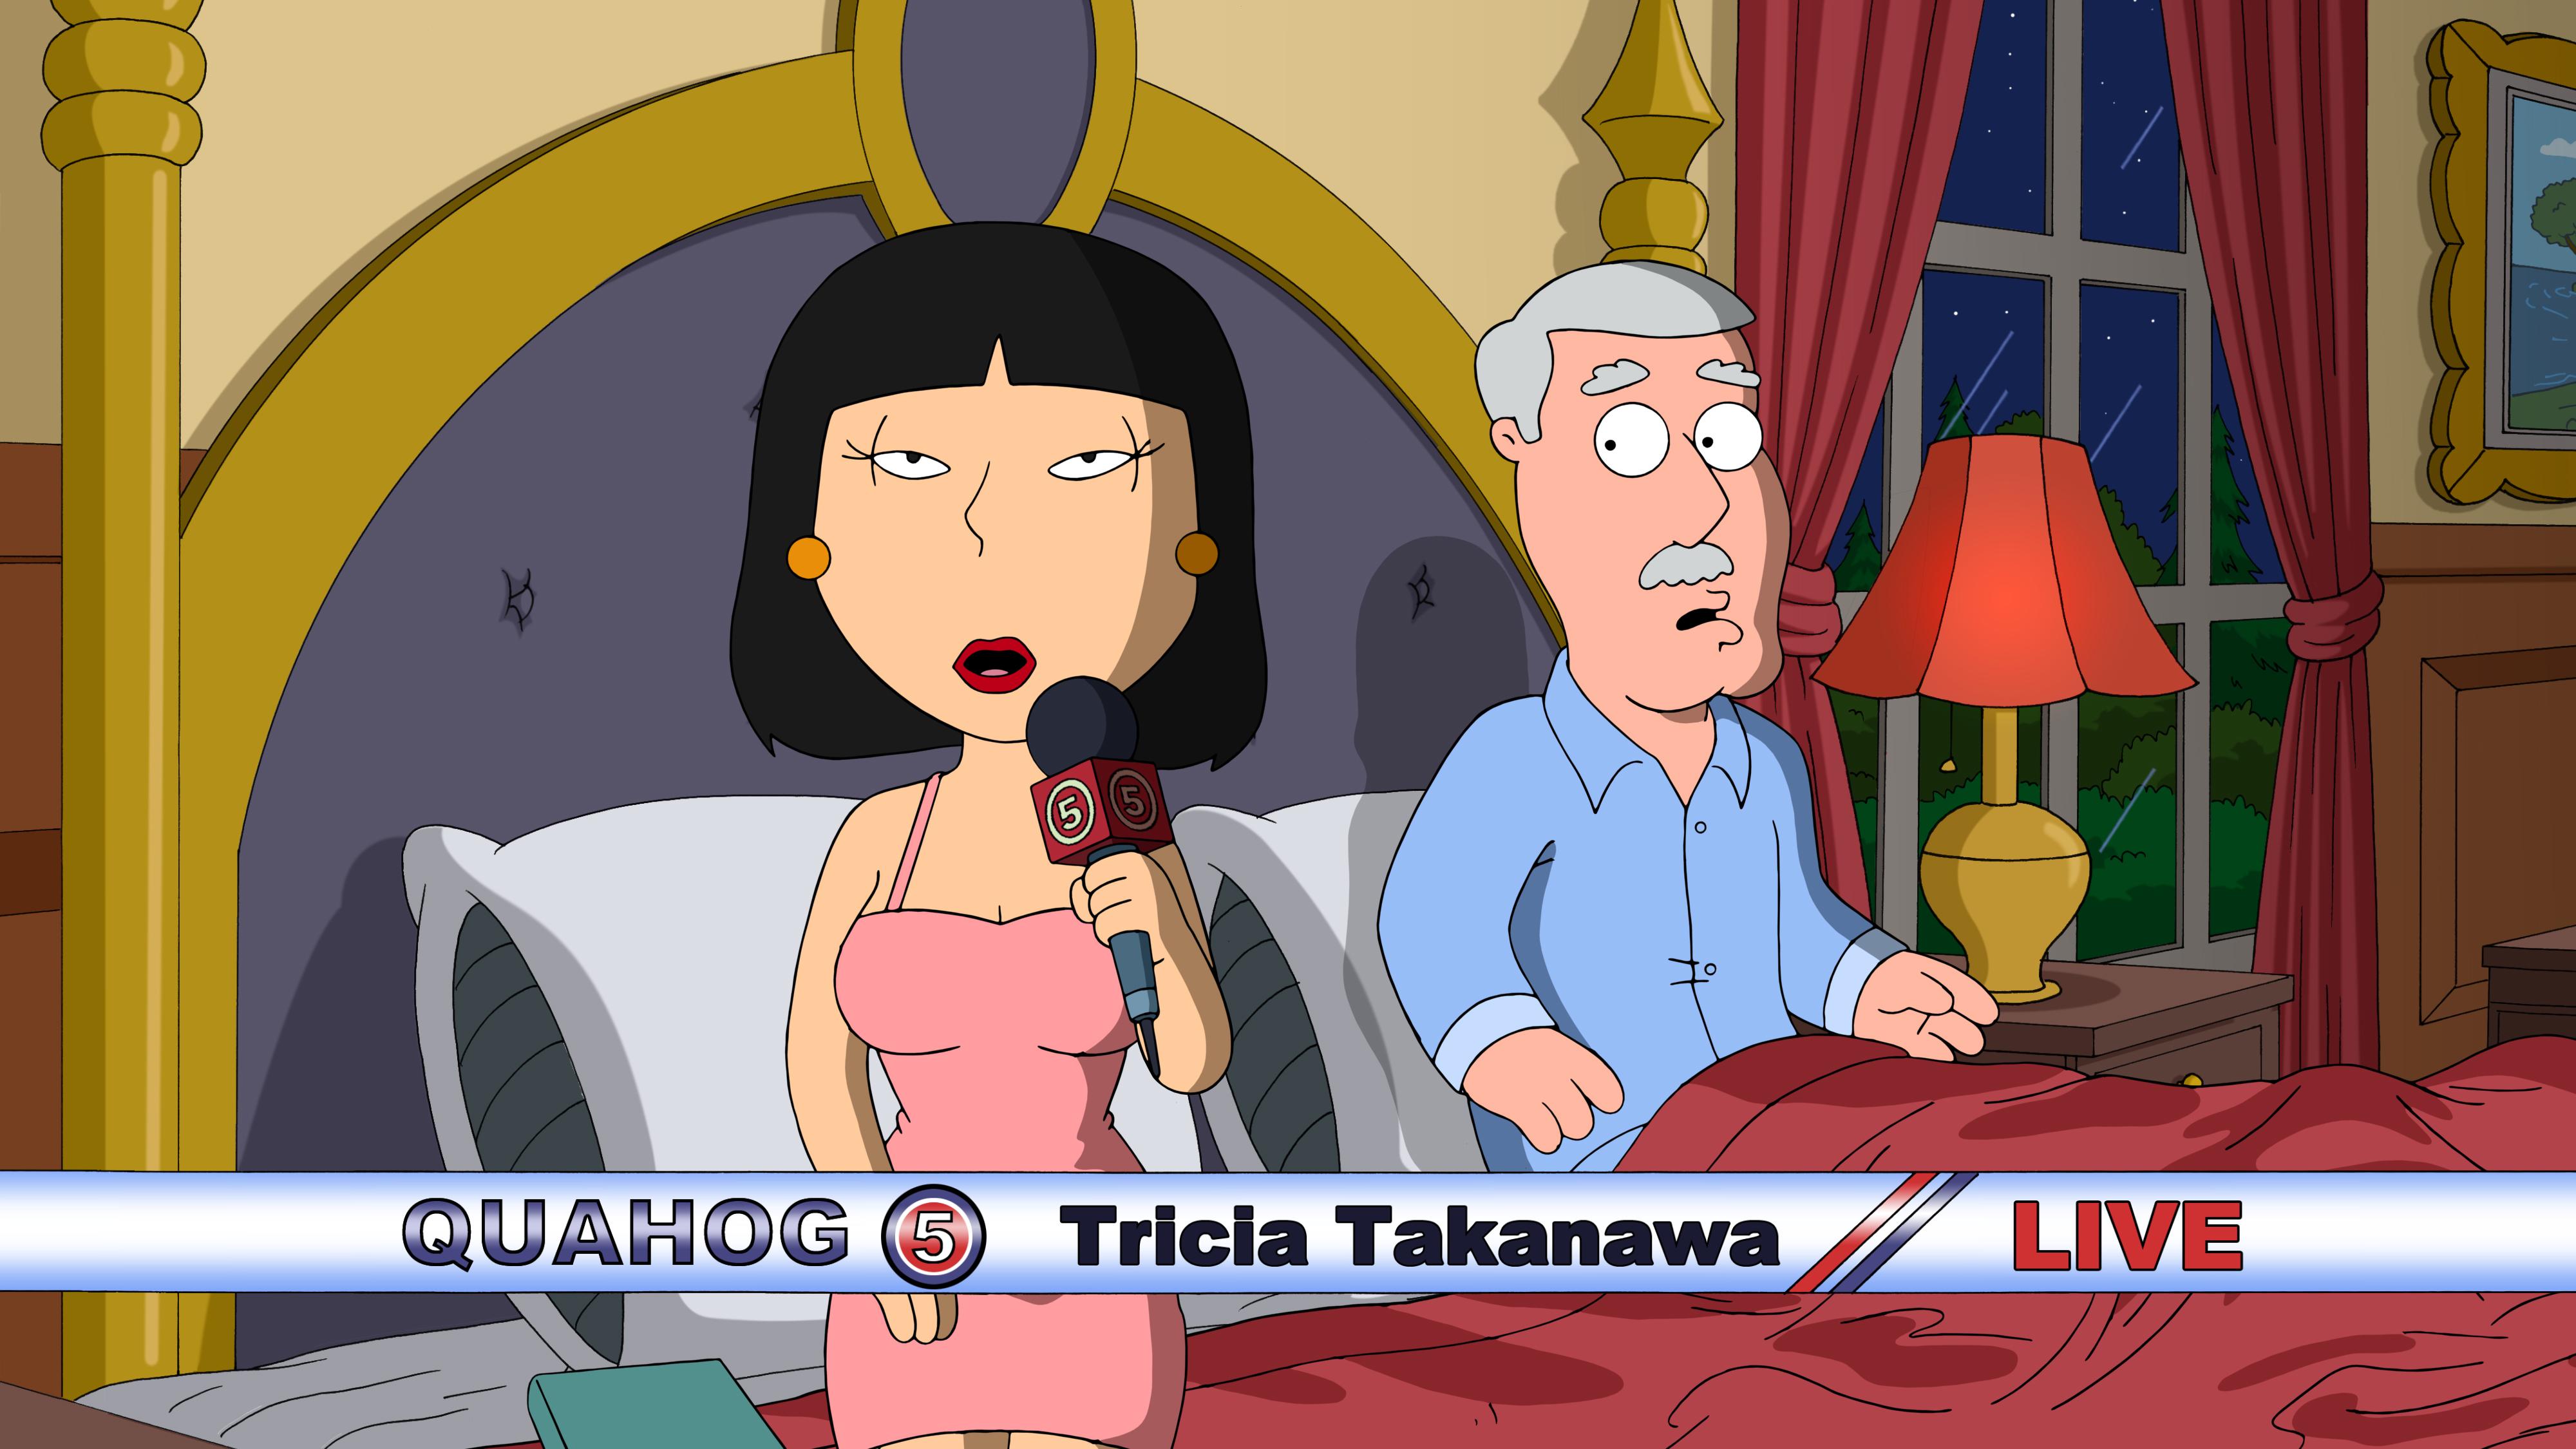 Think, asian reporter tricia takanawa